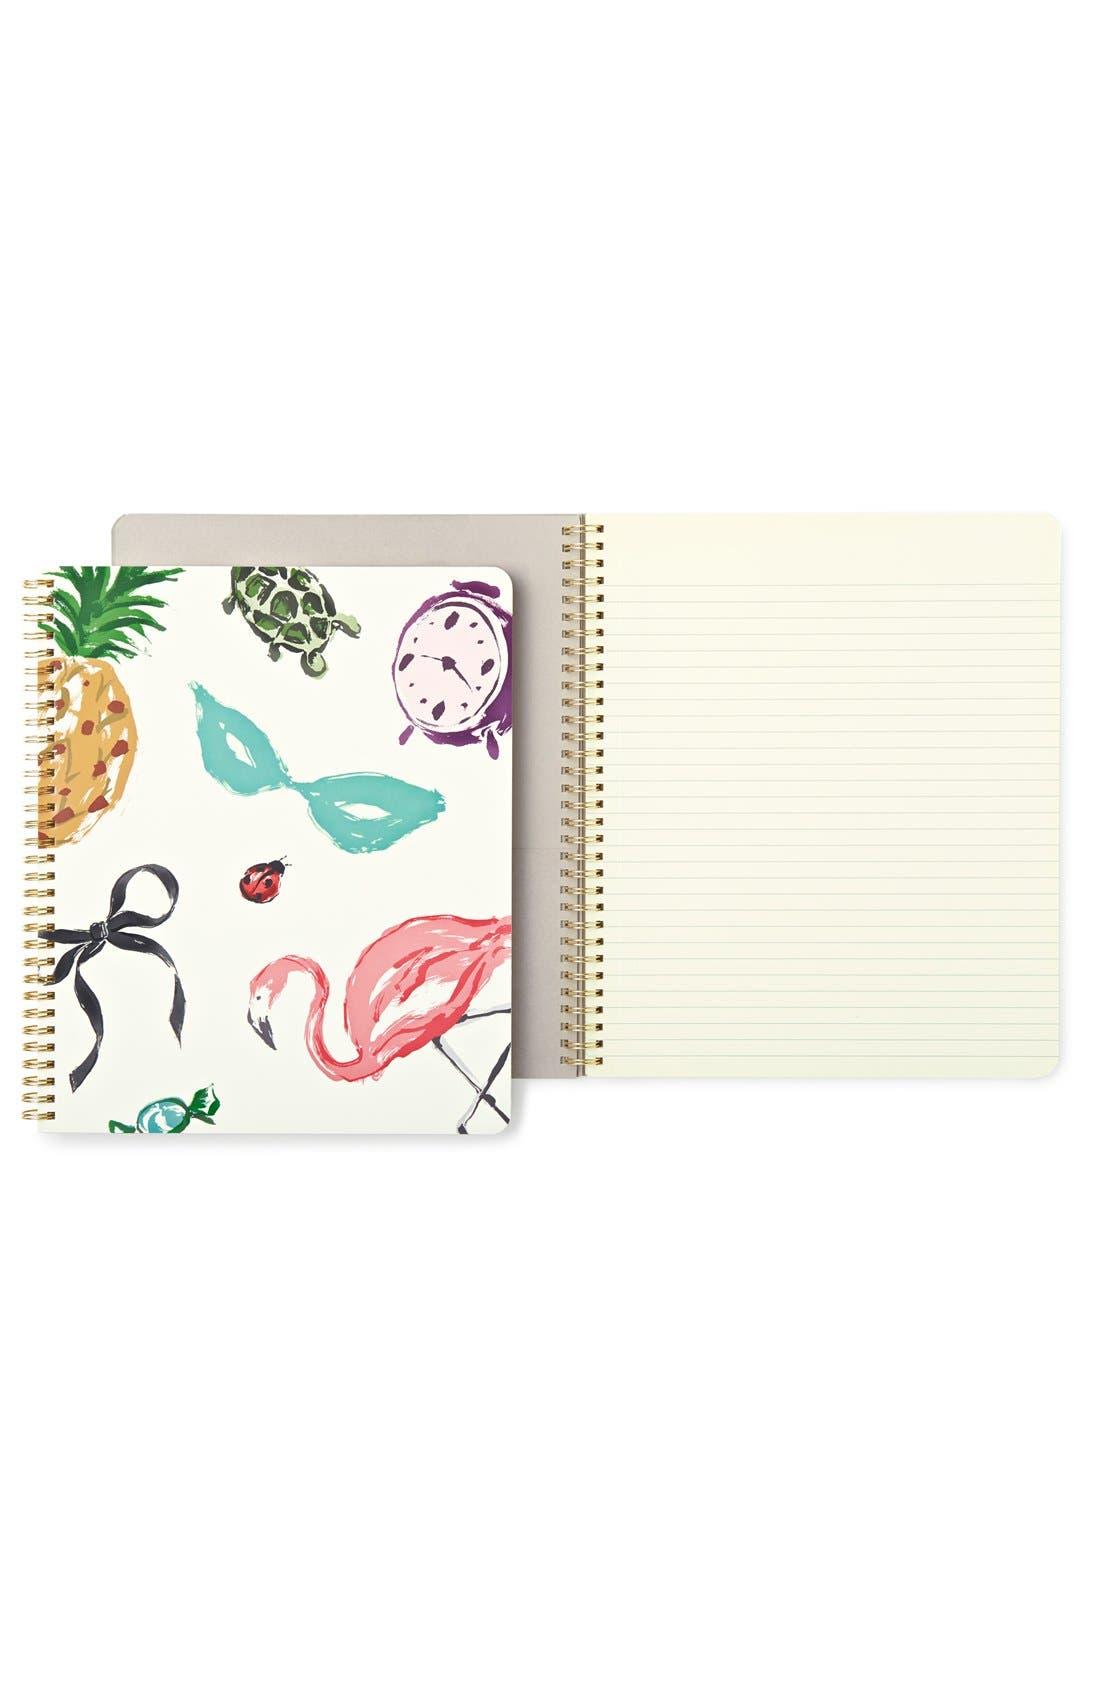 Alternate Image 1 Selected - kate spade new york 'favorite things' notebook